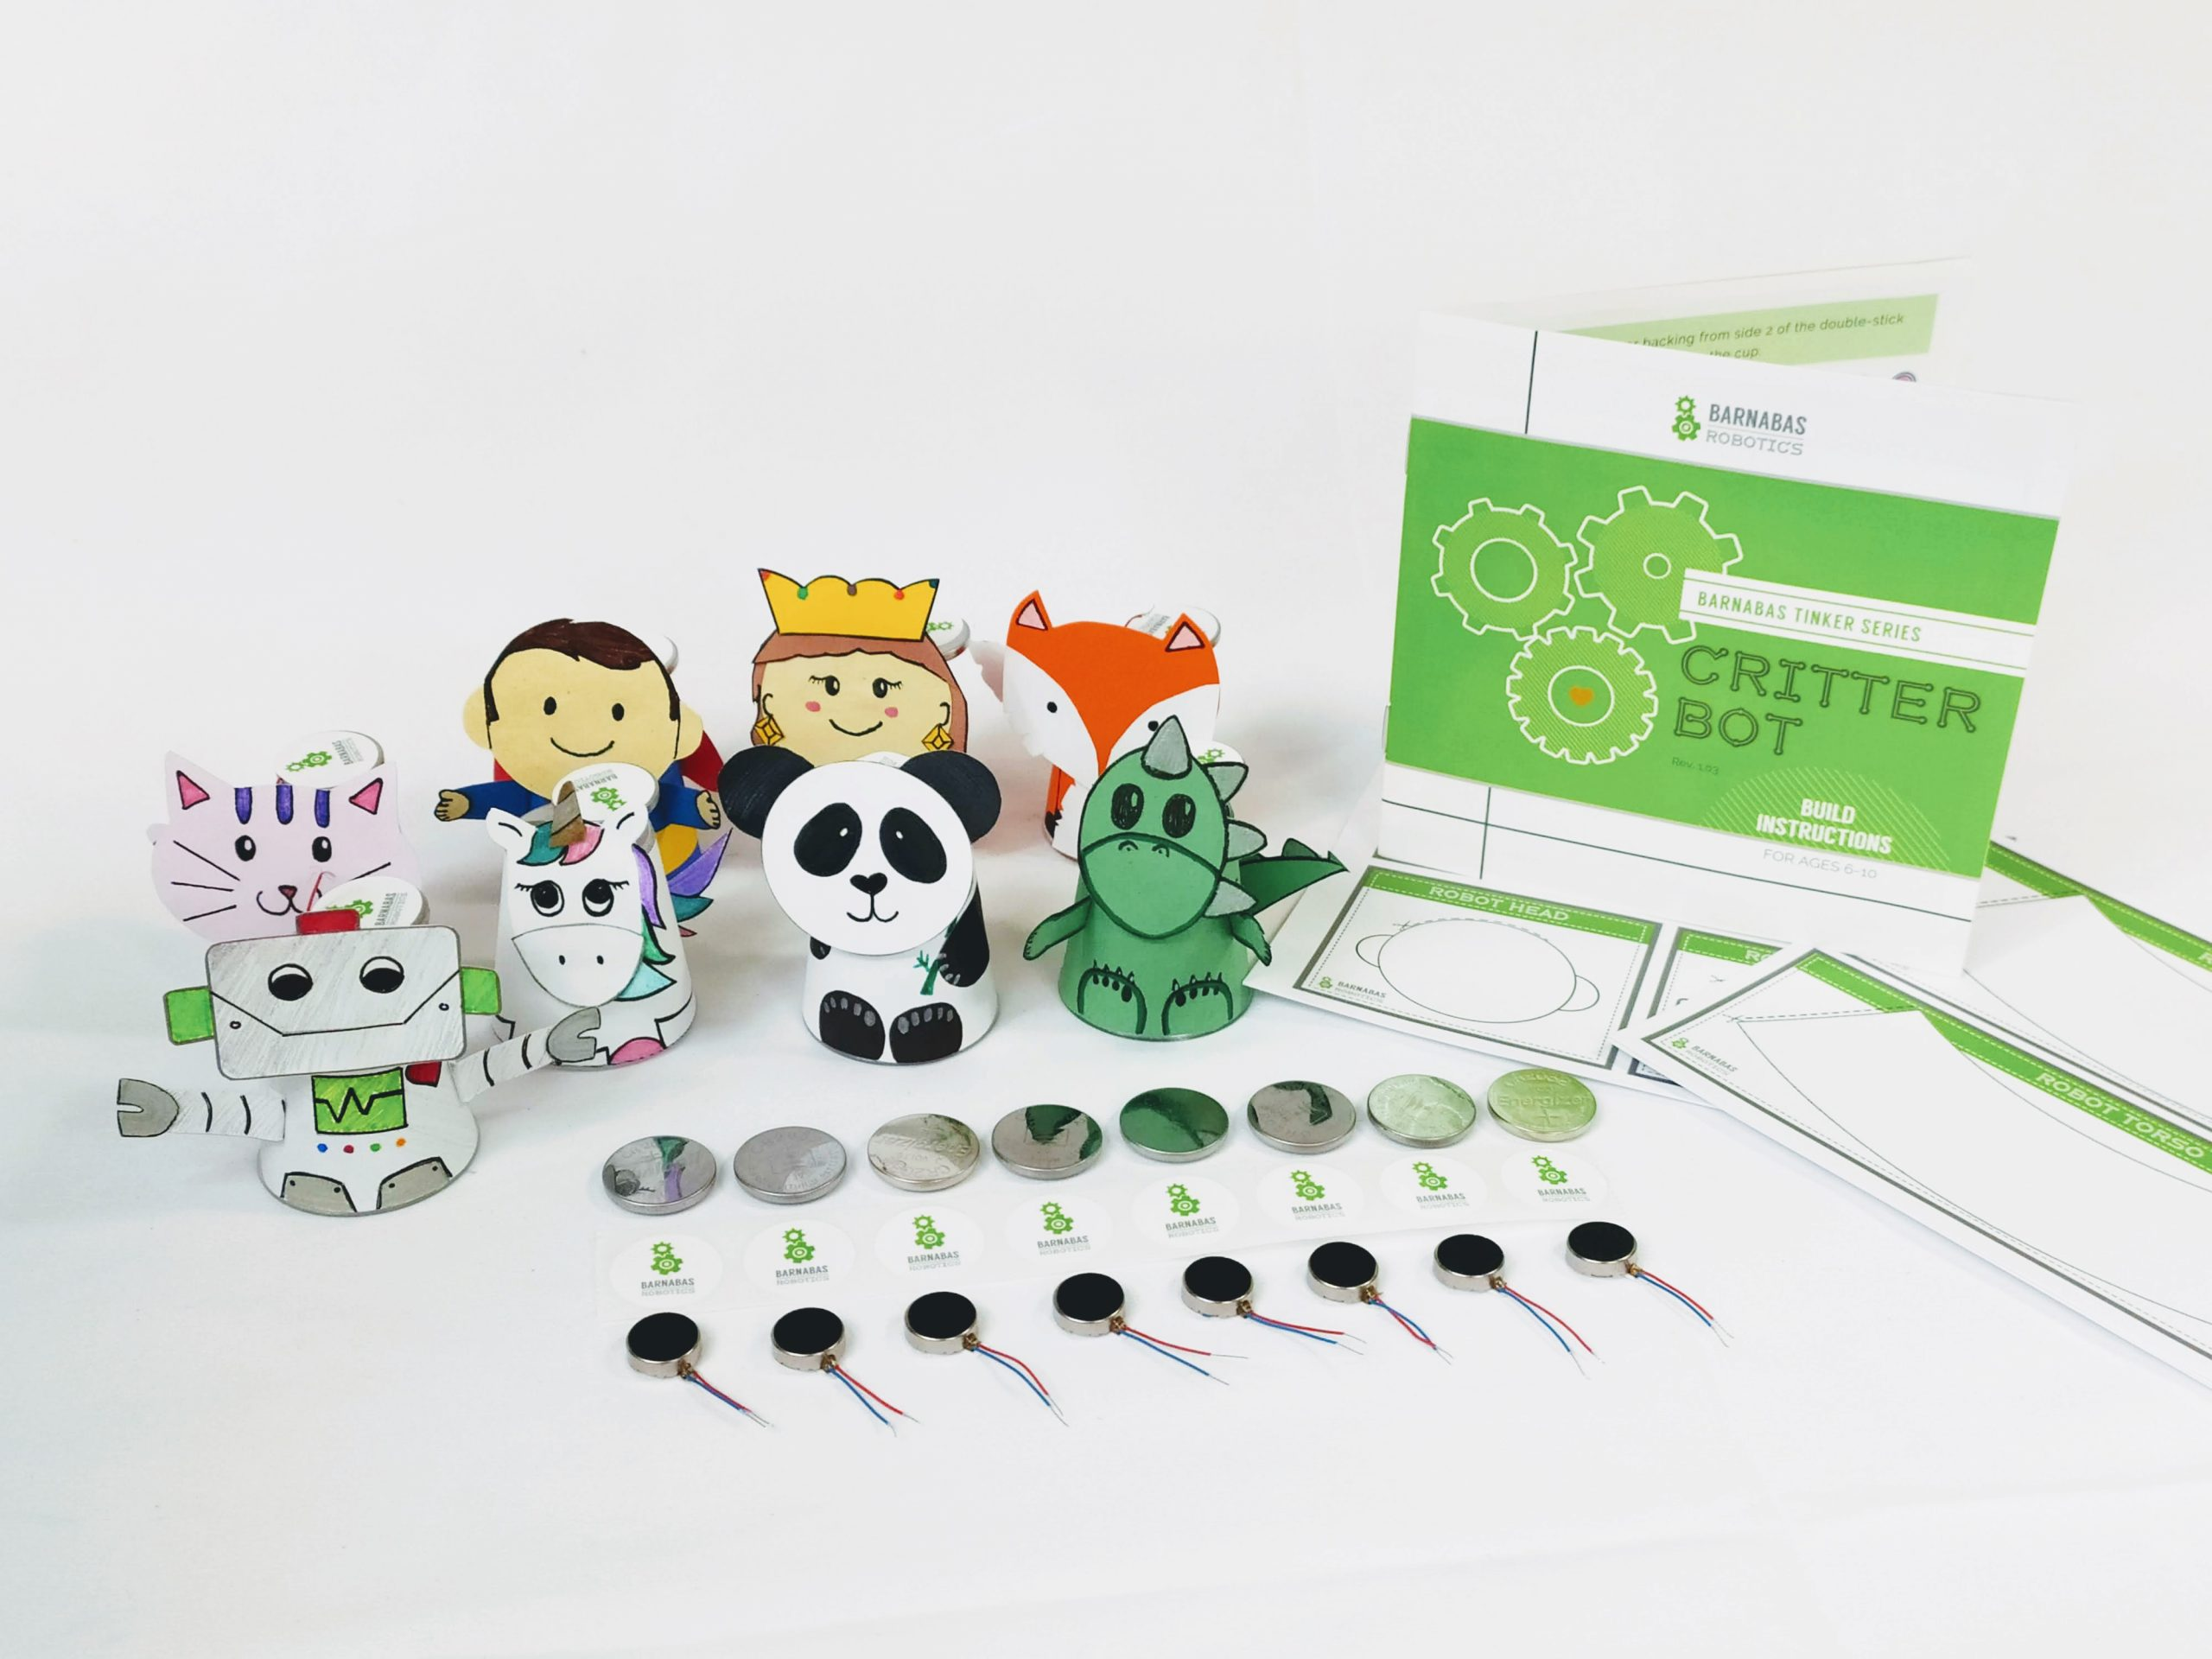 Critter bot (8-pack) craft robot kit